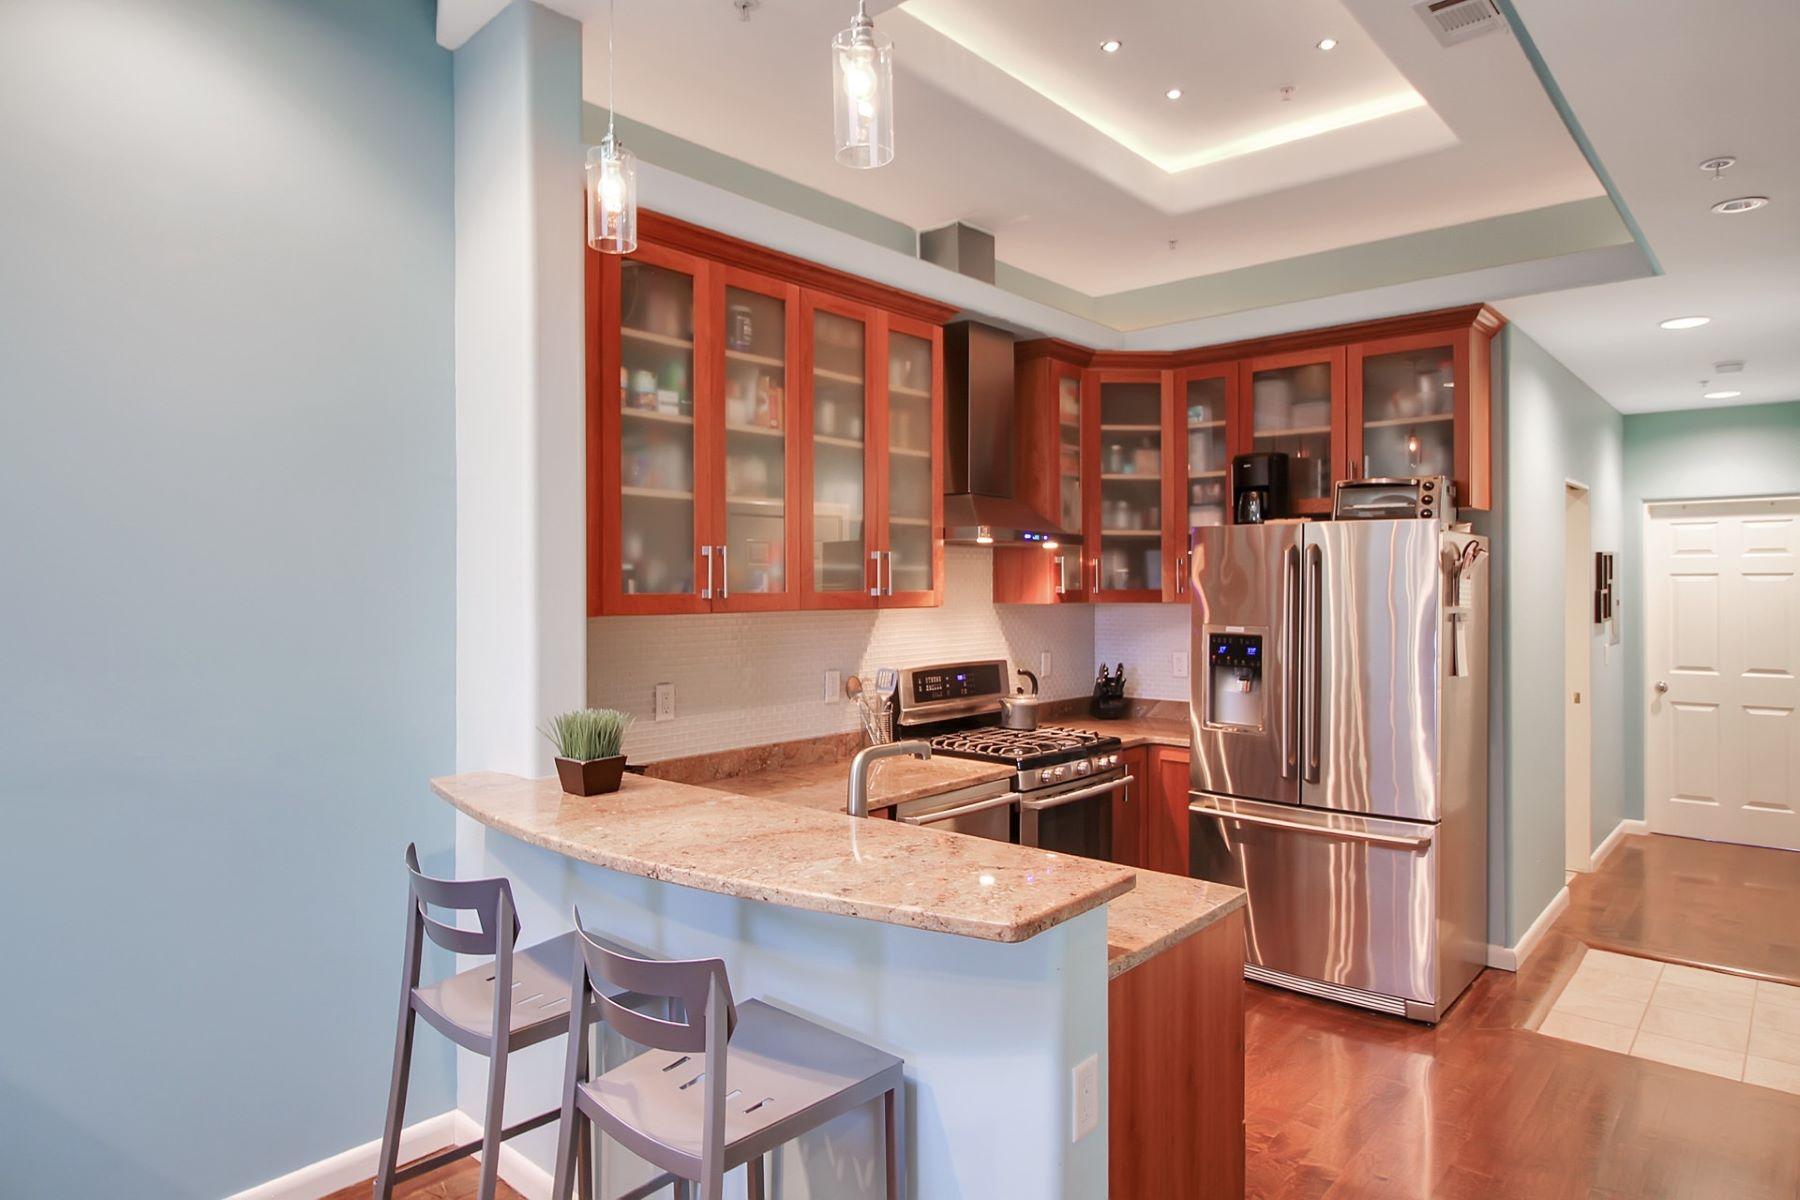 Condominium for Sale at Enjoy the Hoboken lifestyle along NJ's Gold Coast! 933 Garden St #5L, Hoboken, New Jersey 07030 United States